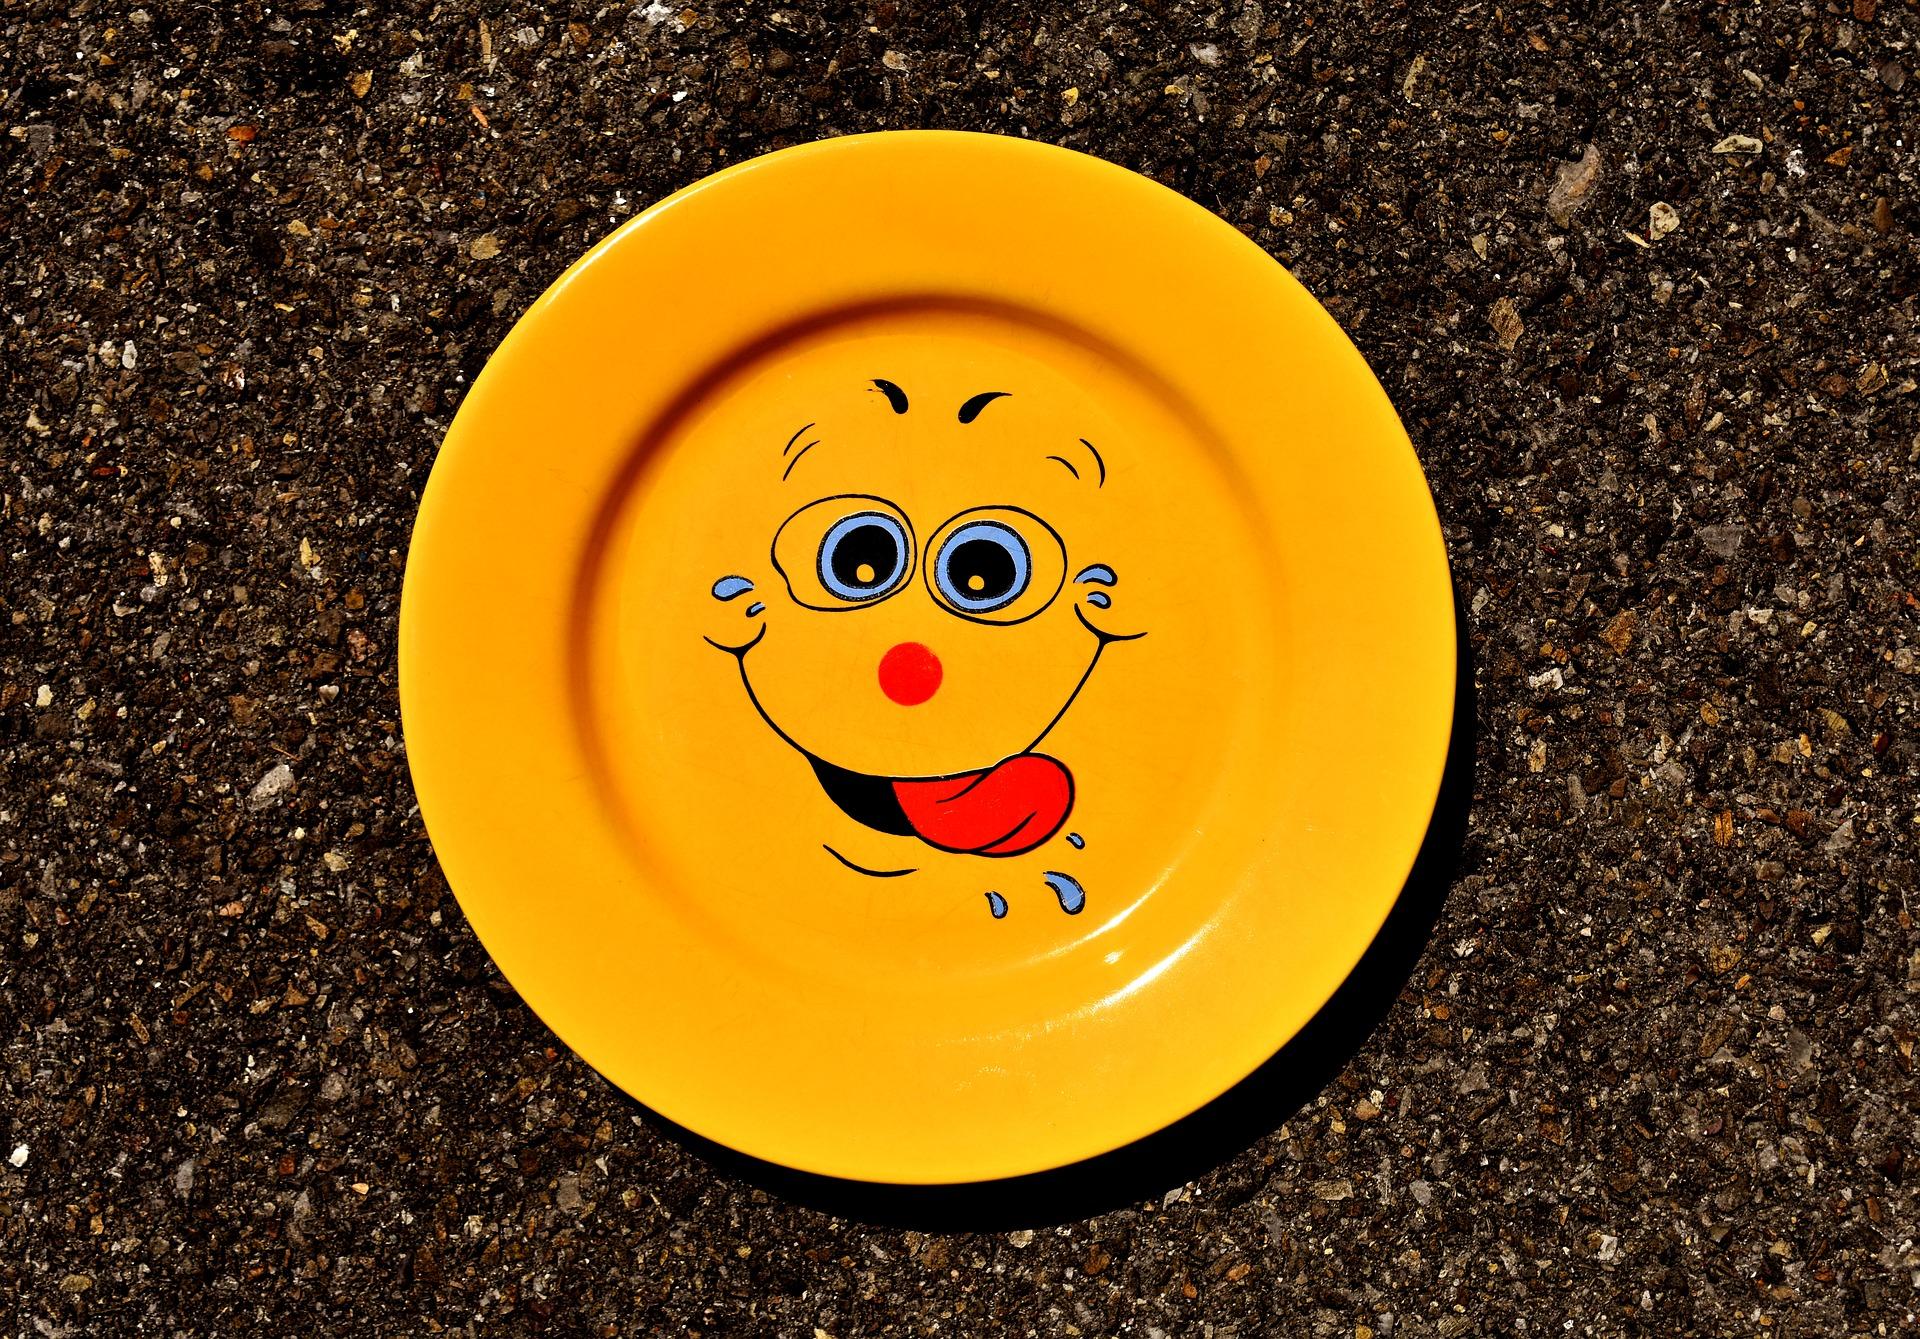 plate-2393323_1920